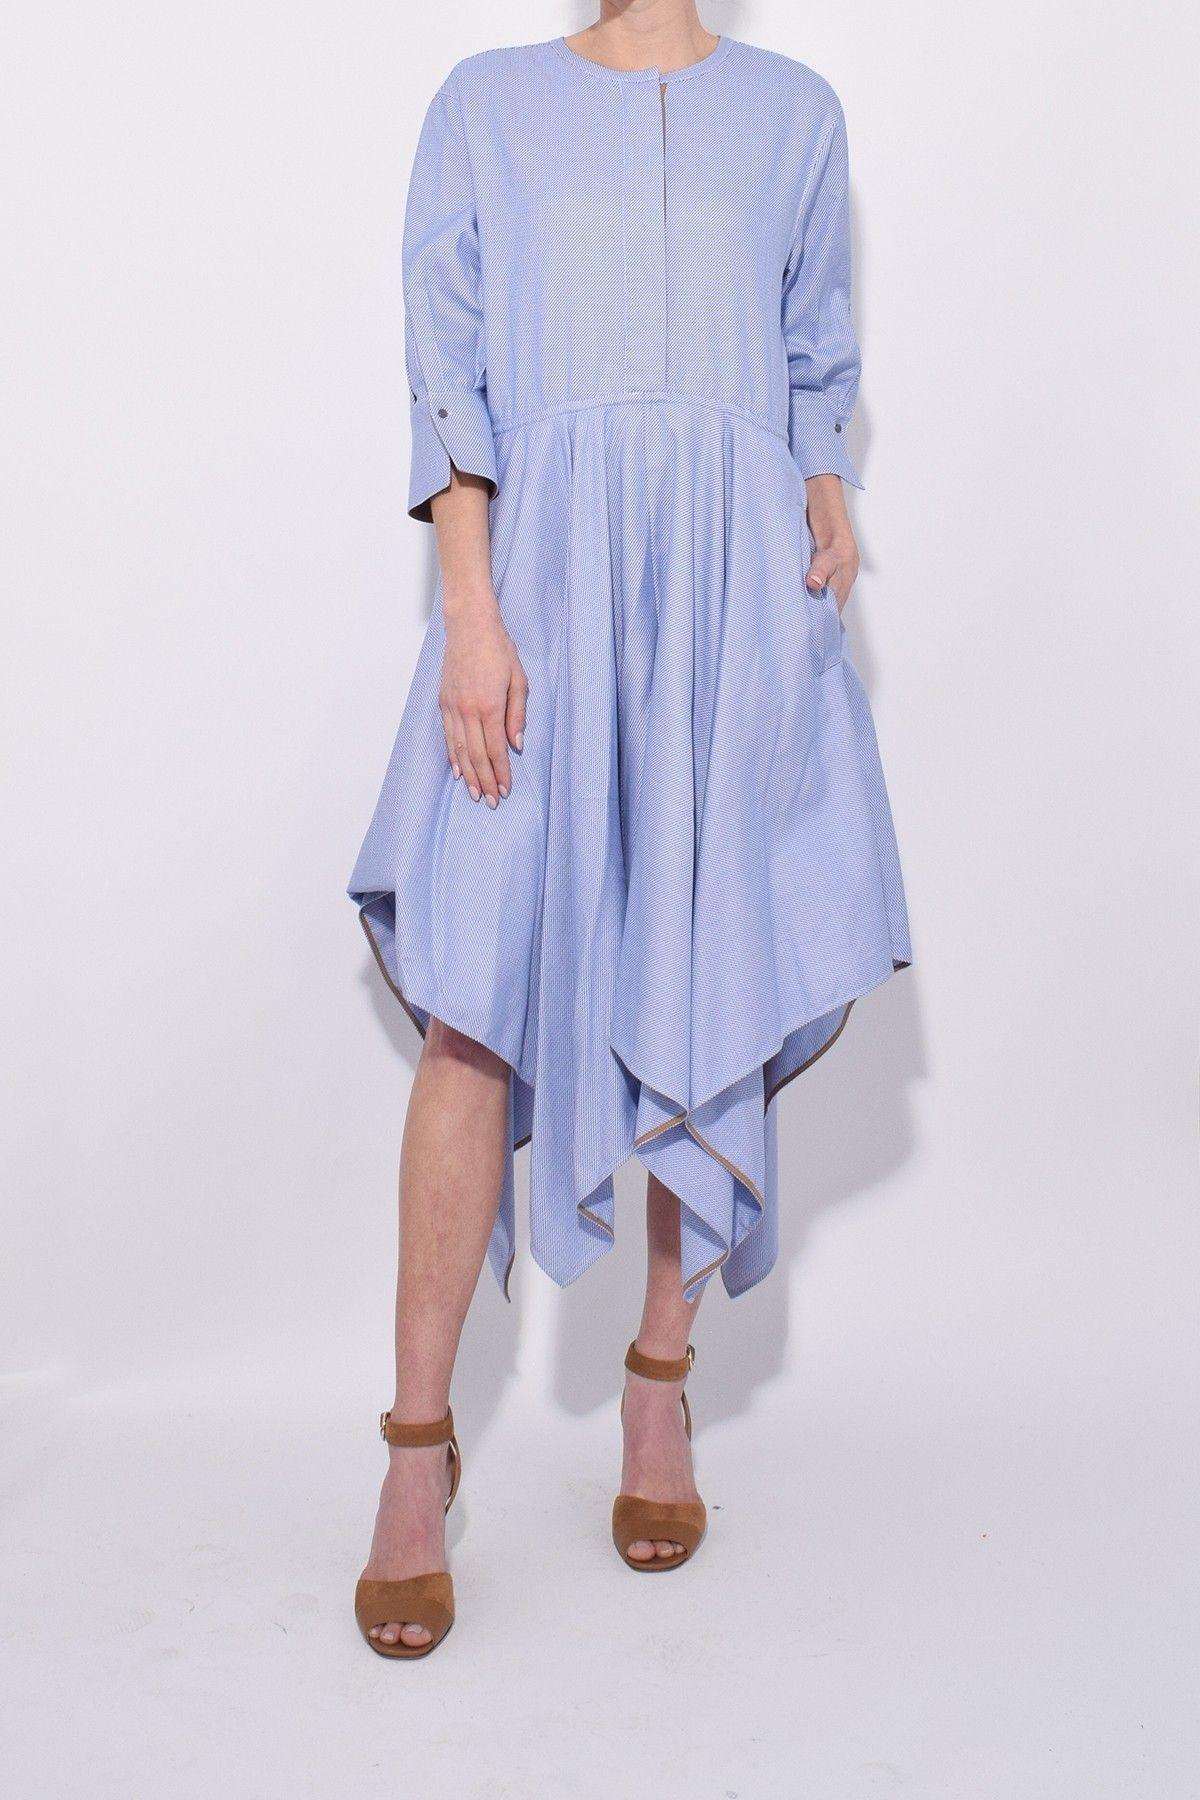 6301c8eeb9e Dorothee Schumacher Neo Shirtings Dress in Oxford Blue